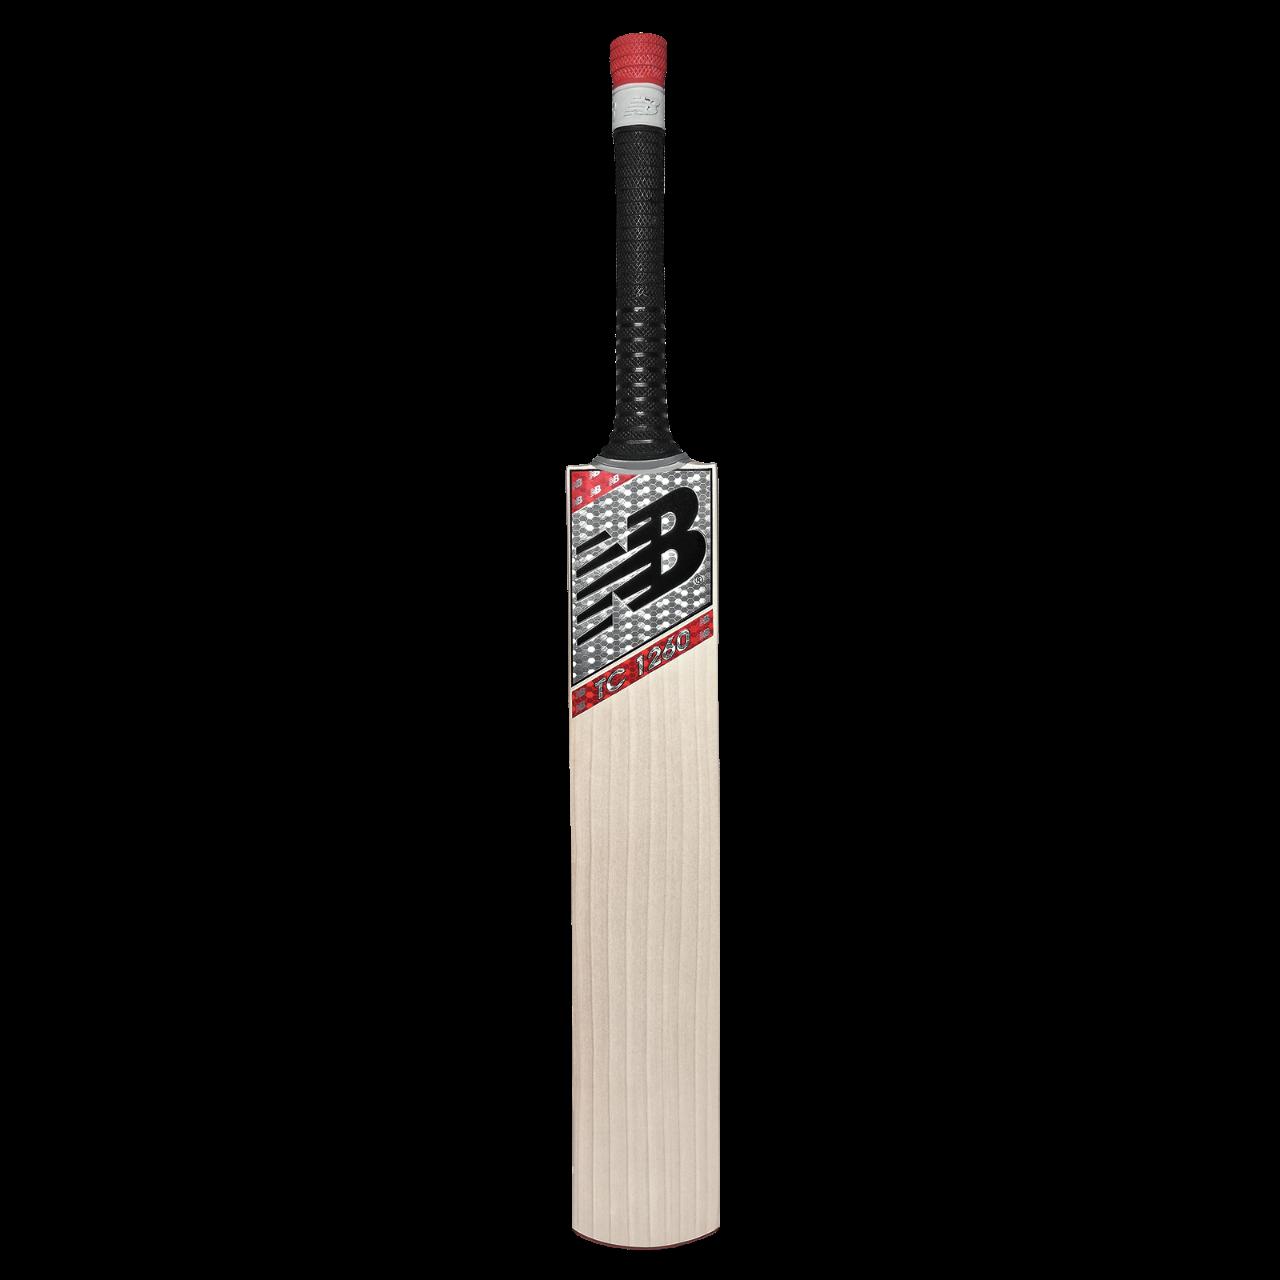 2020 New Balance TC 1260 Cricket Bat